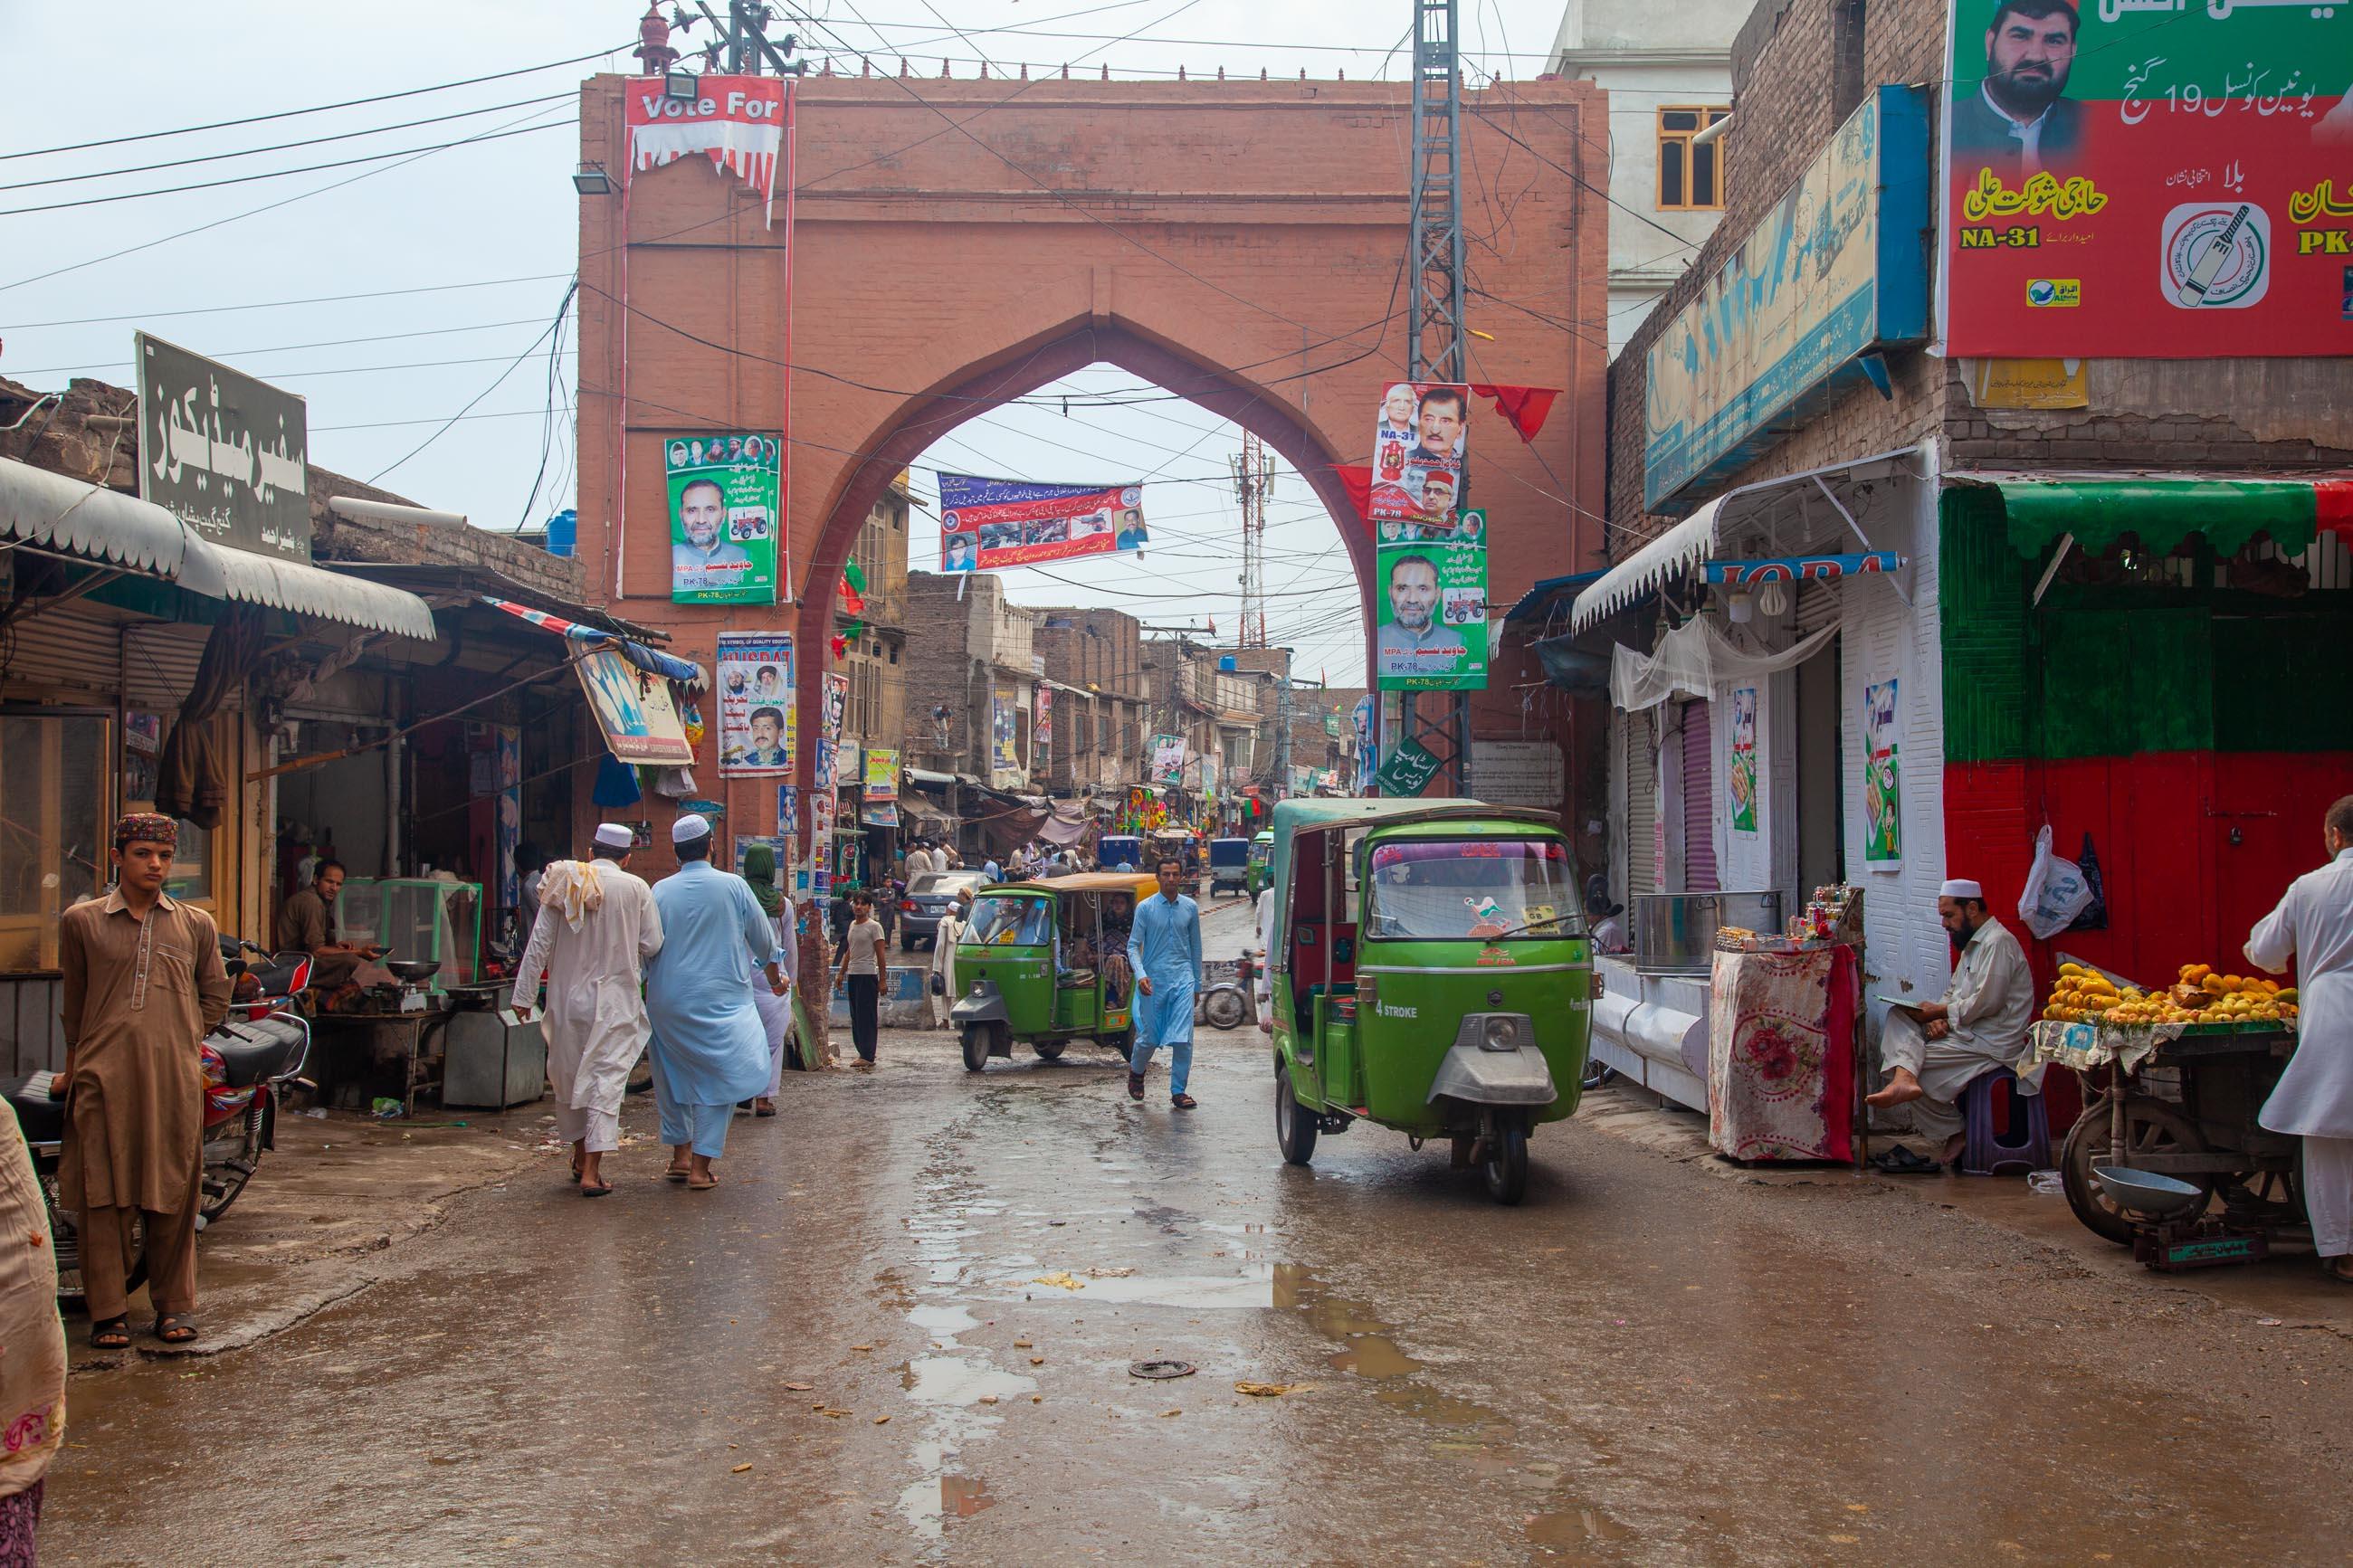 https://bubo.sk/uploads/galleries/4920/samuelklc_pakistan_peshawar_lahore_img_0001.jpg